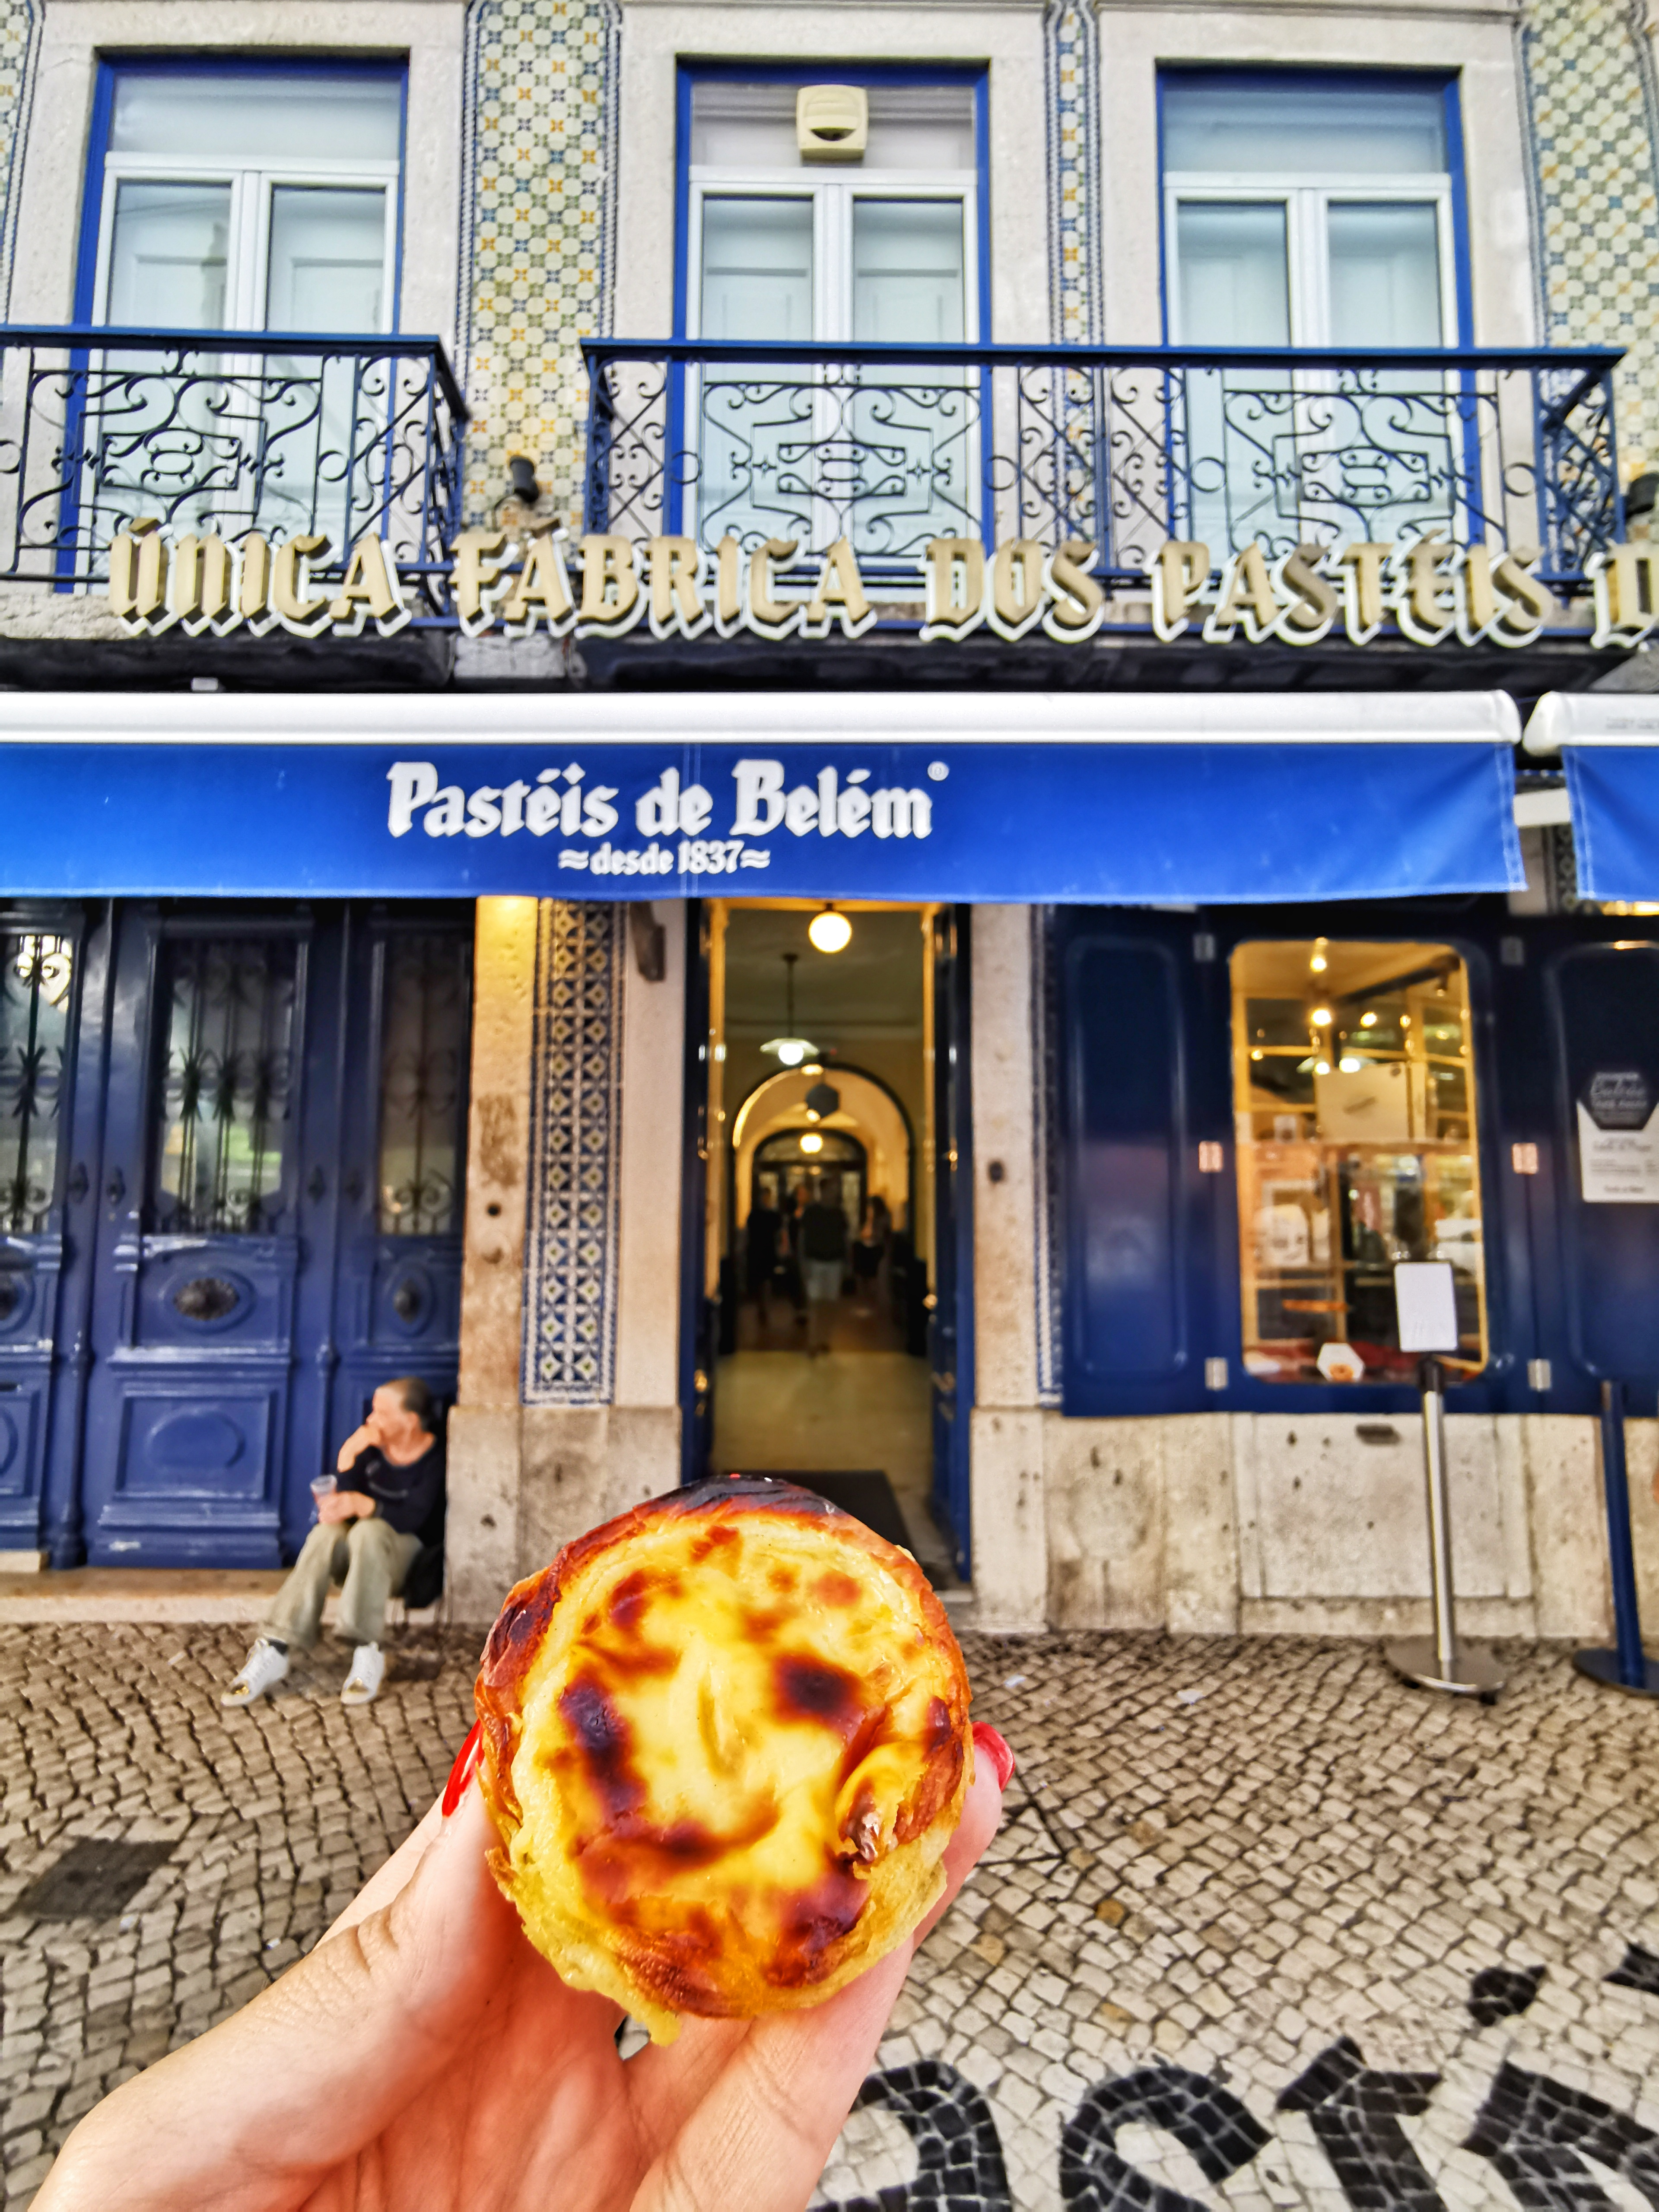 pasteisdeBelem_pasteisdeNata_oldestNataplacesince1837_lisbon_lisboa_portugal